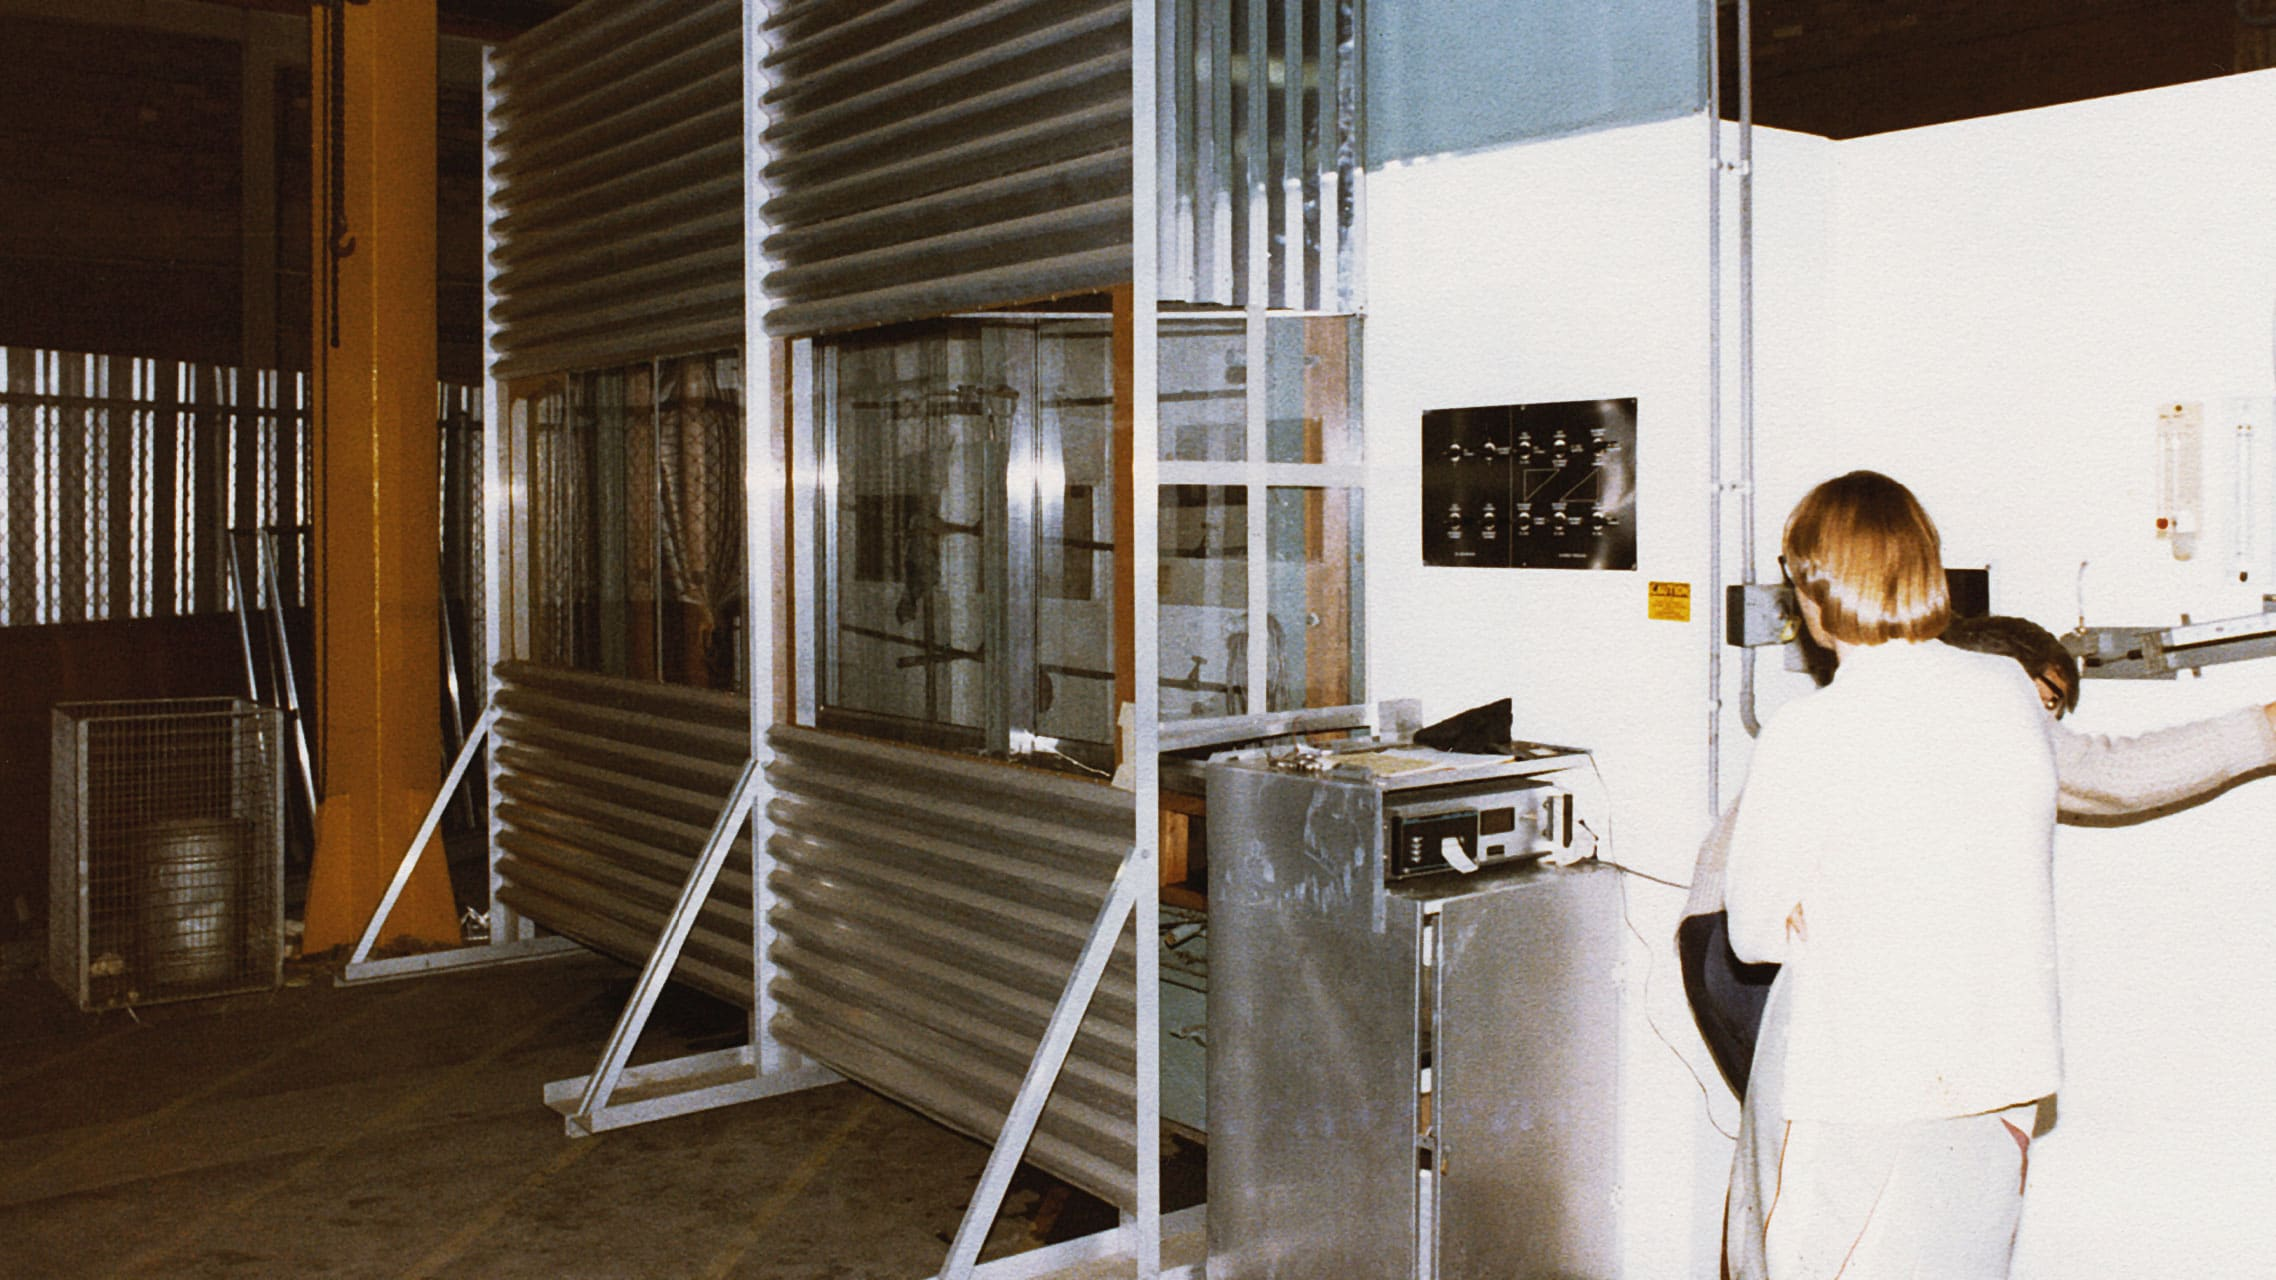 Original Bradnam's Windows & Doors testing facility